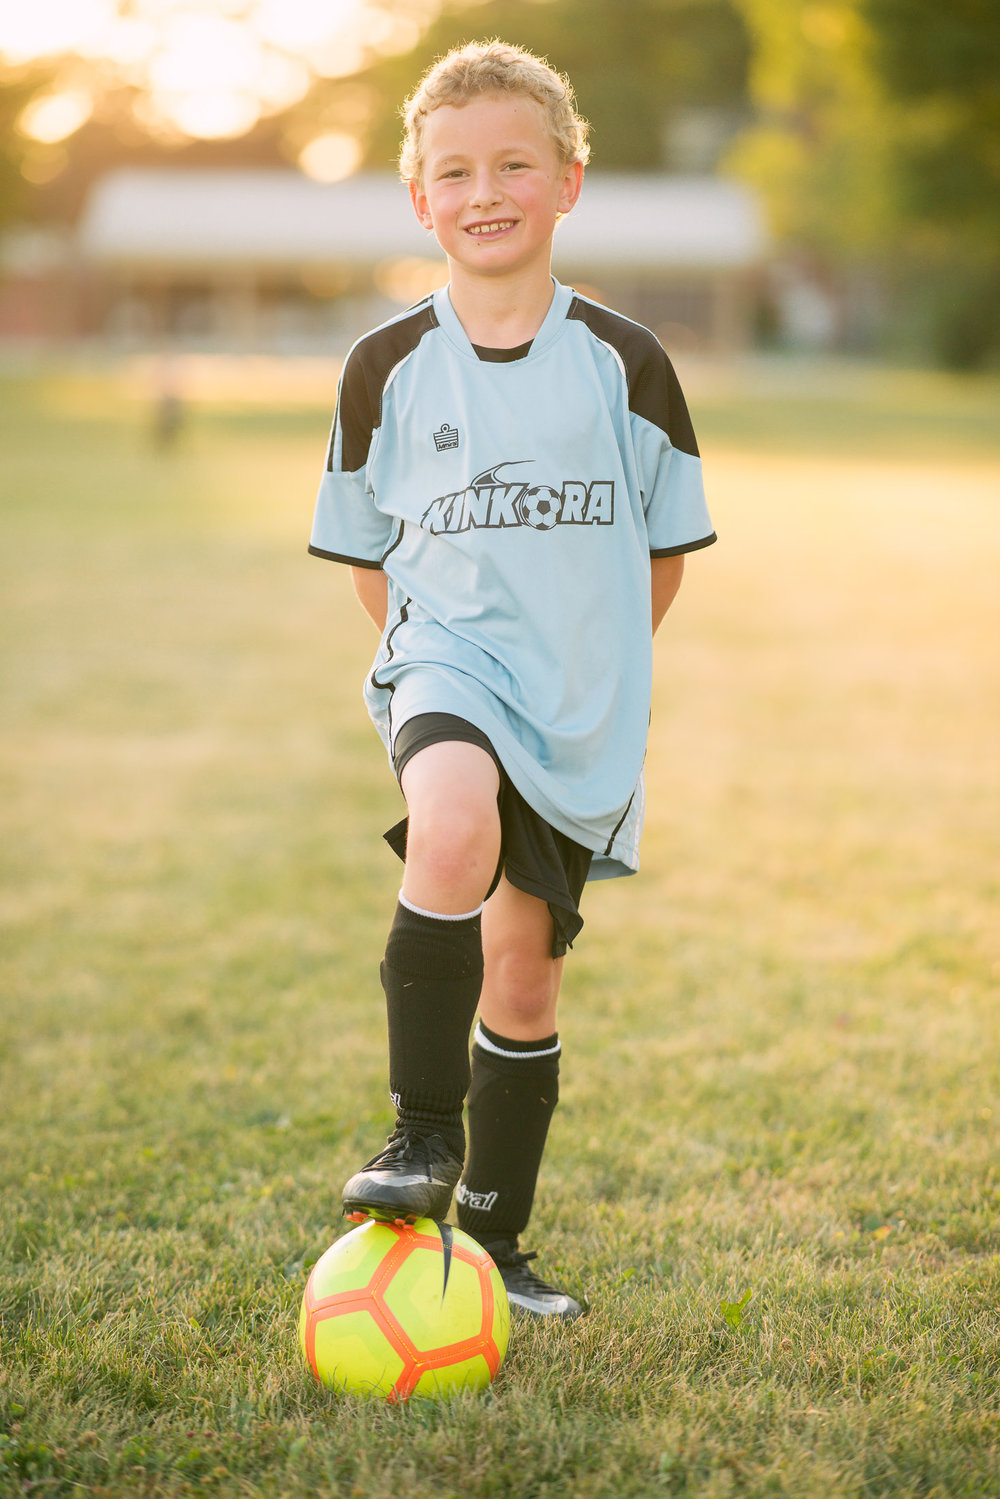 Kinkora-Soccer-Photos-053.jpg